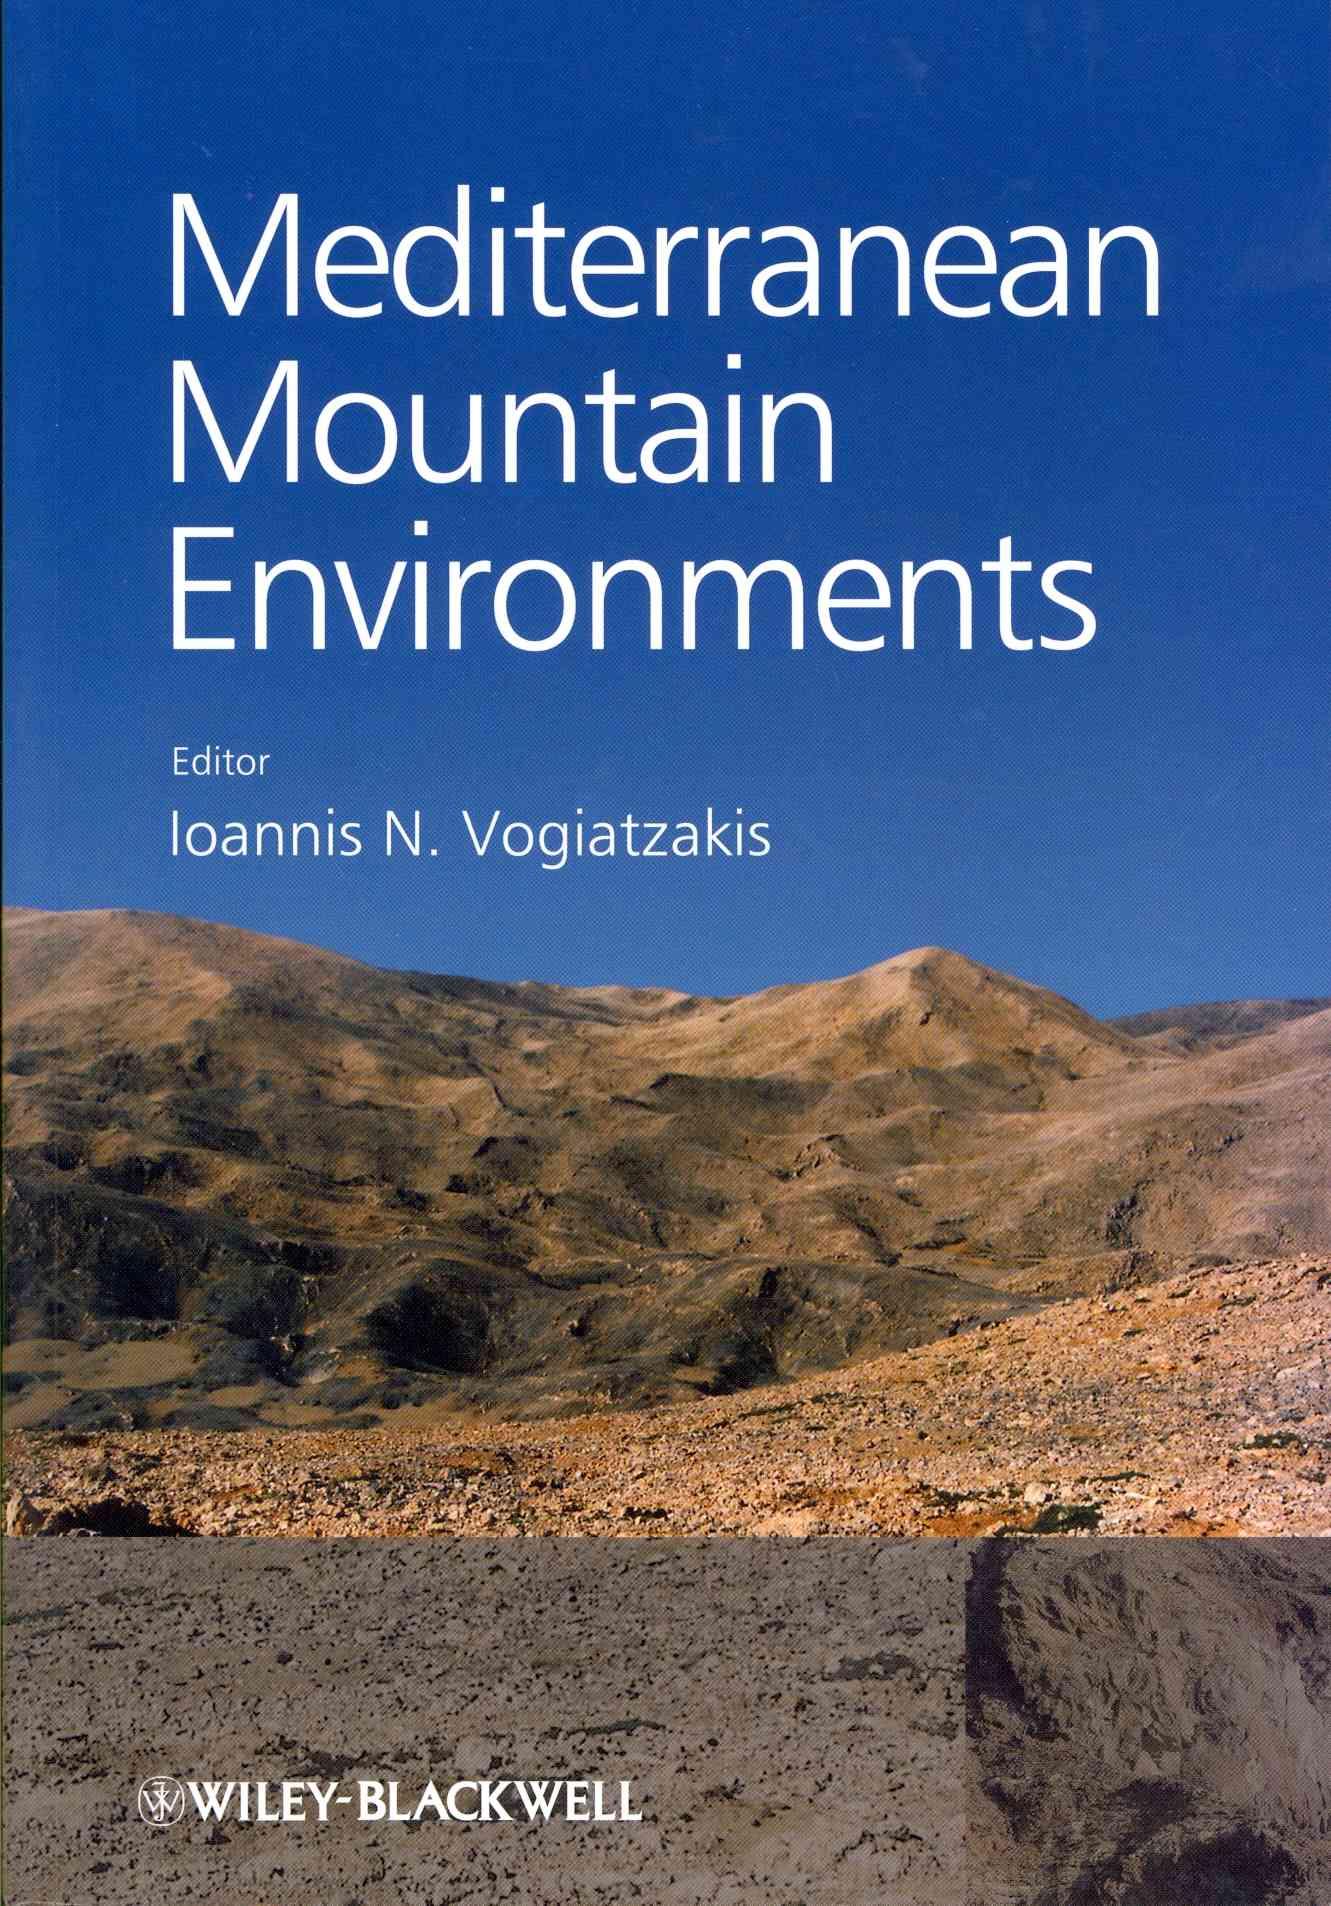 Mediterranean Mountain Environments (Paperback)